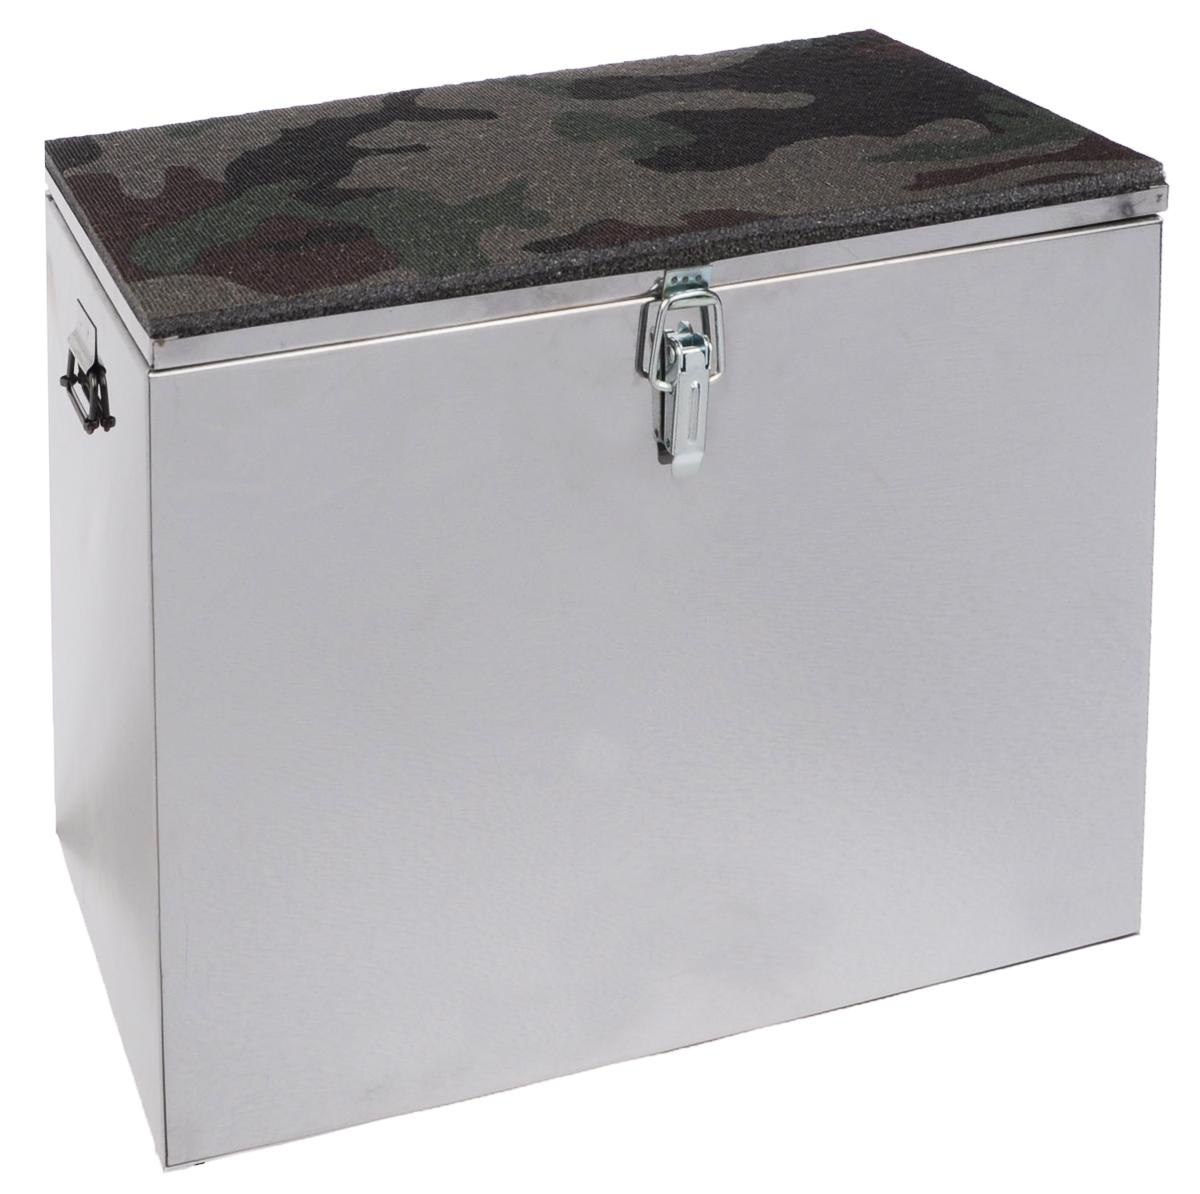 Ящик рыболова Рост, 40 см х 19 см х 29 см. 2447